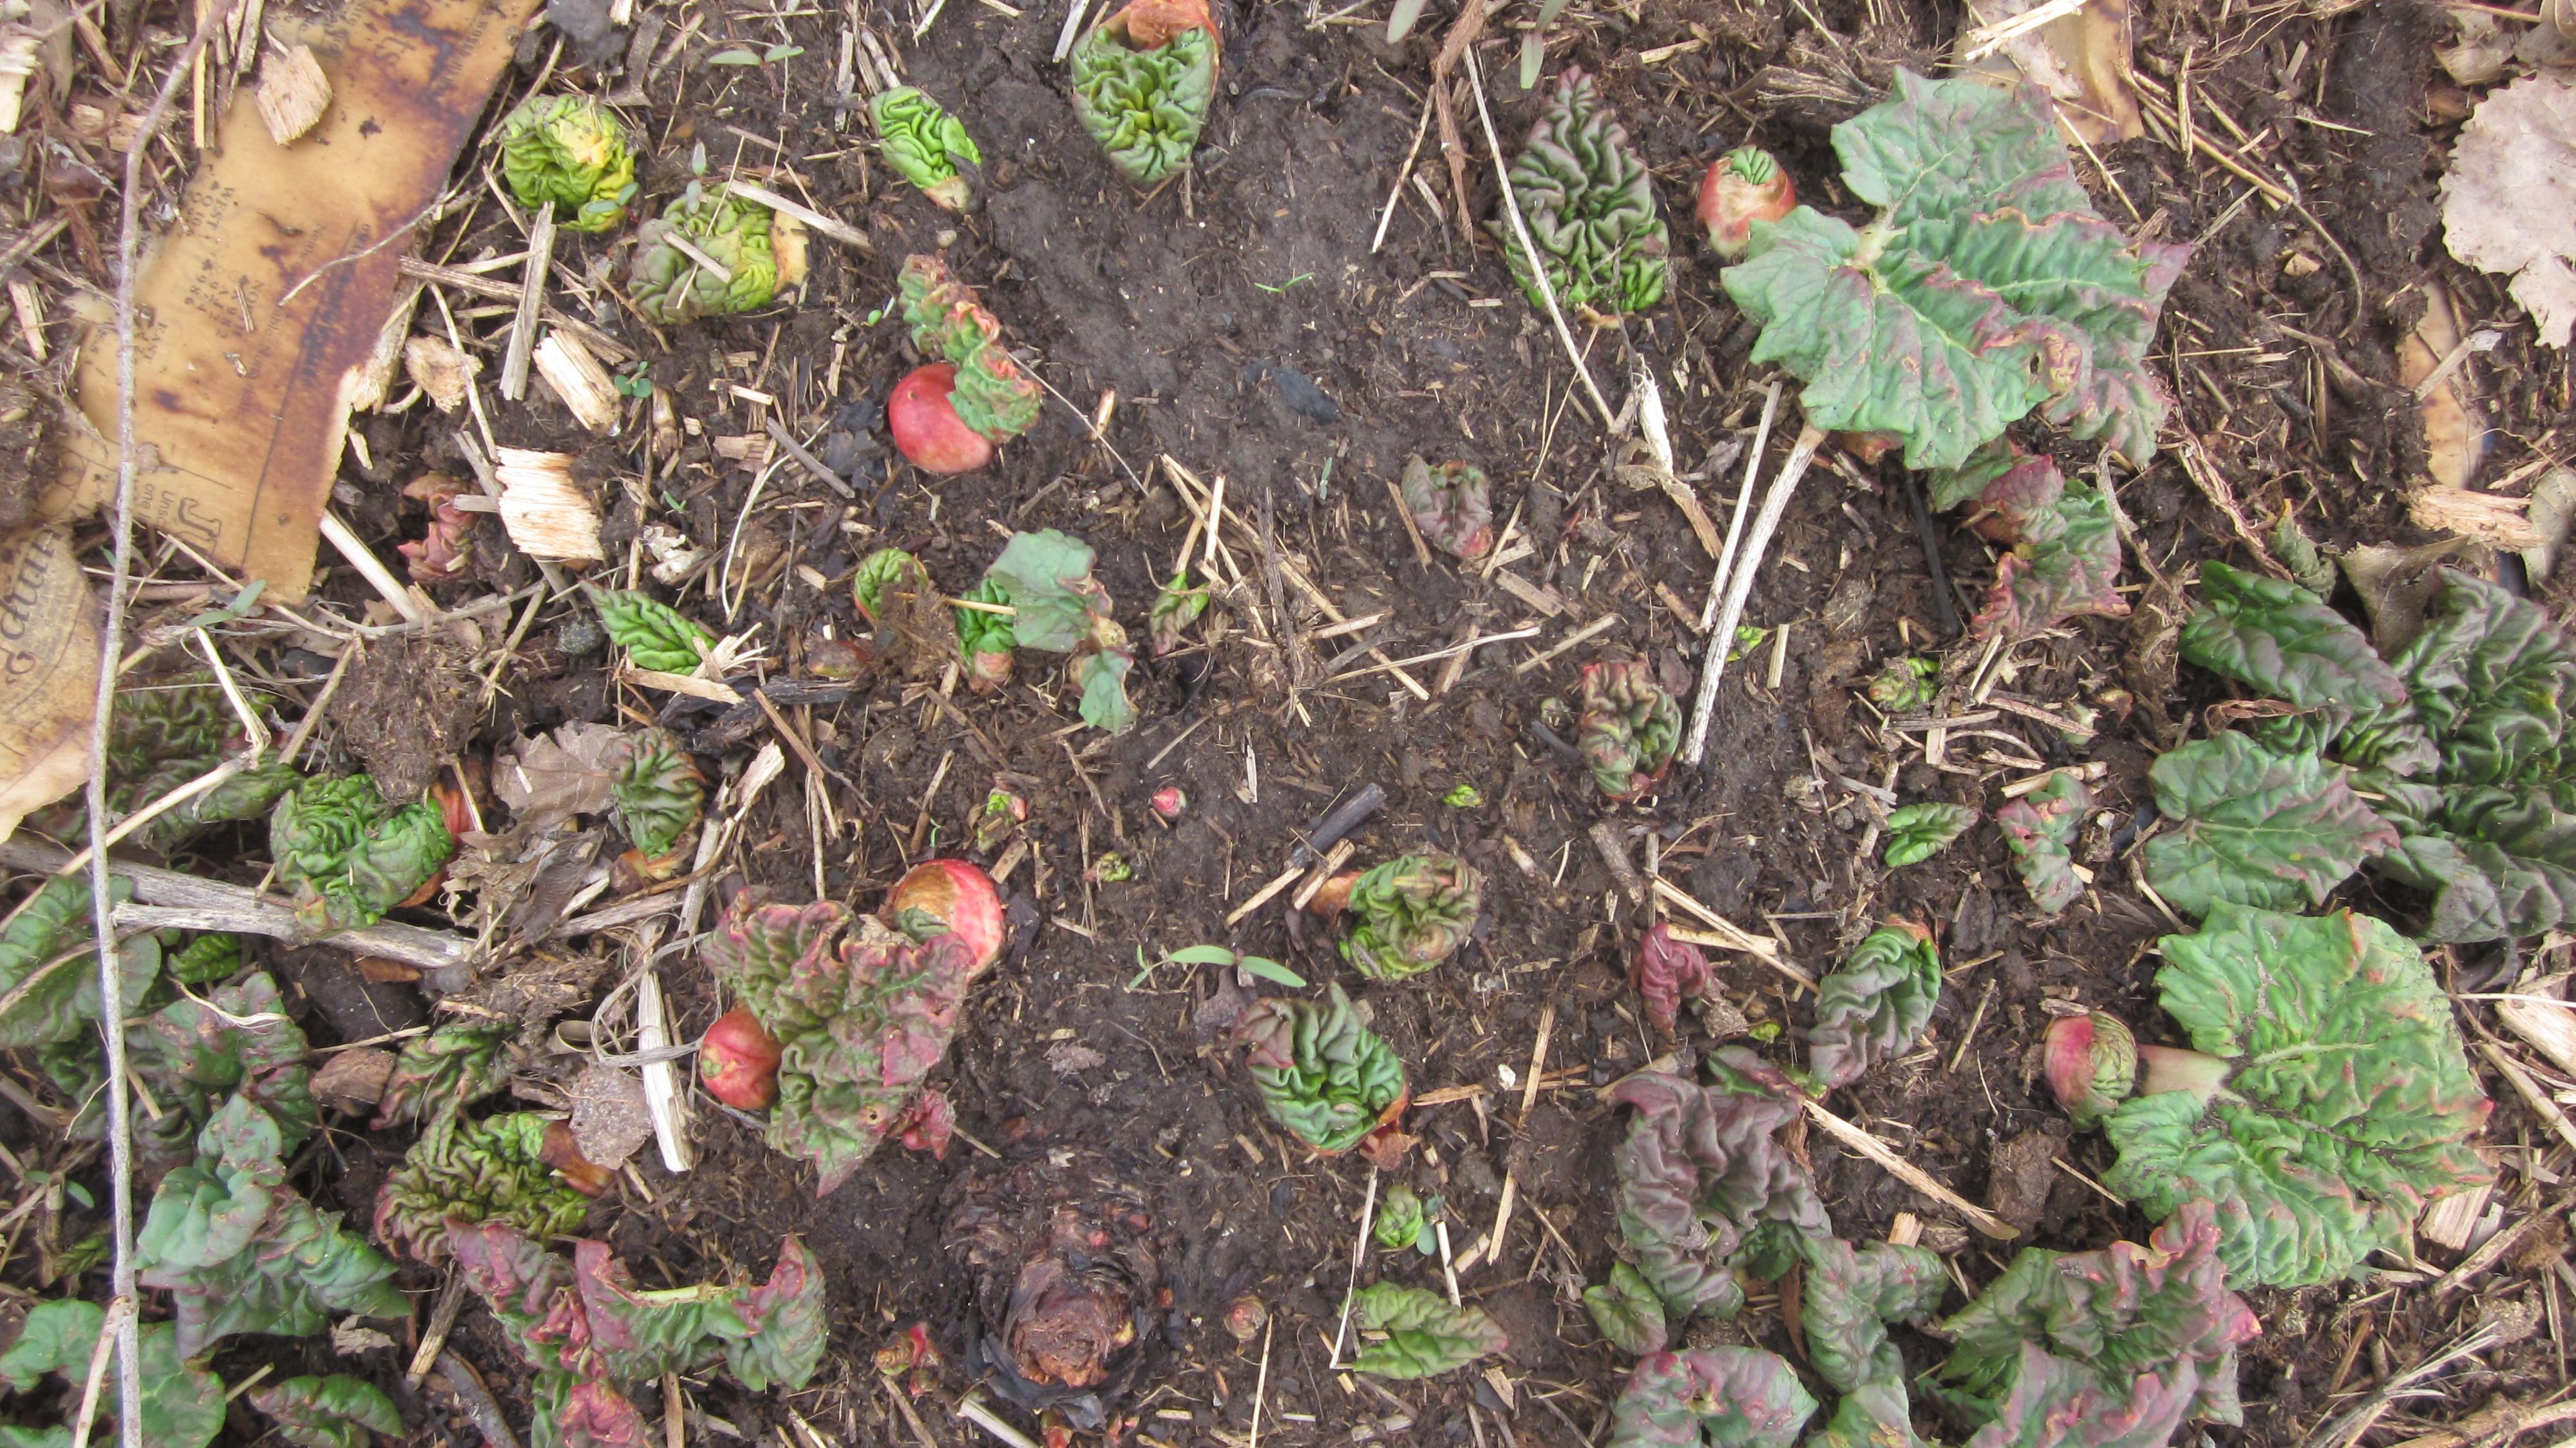 Rhubarb-dividing time will be followed by pie-making season!